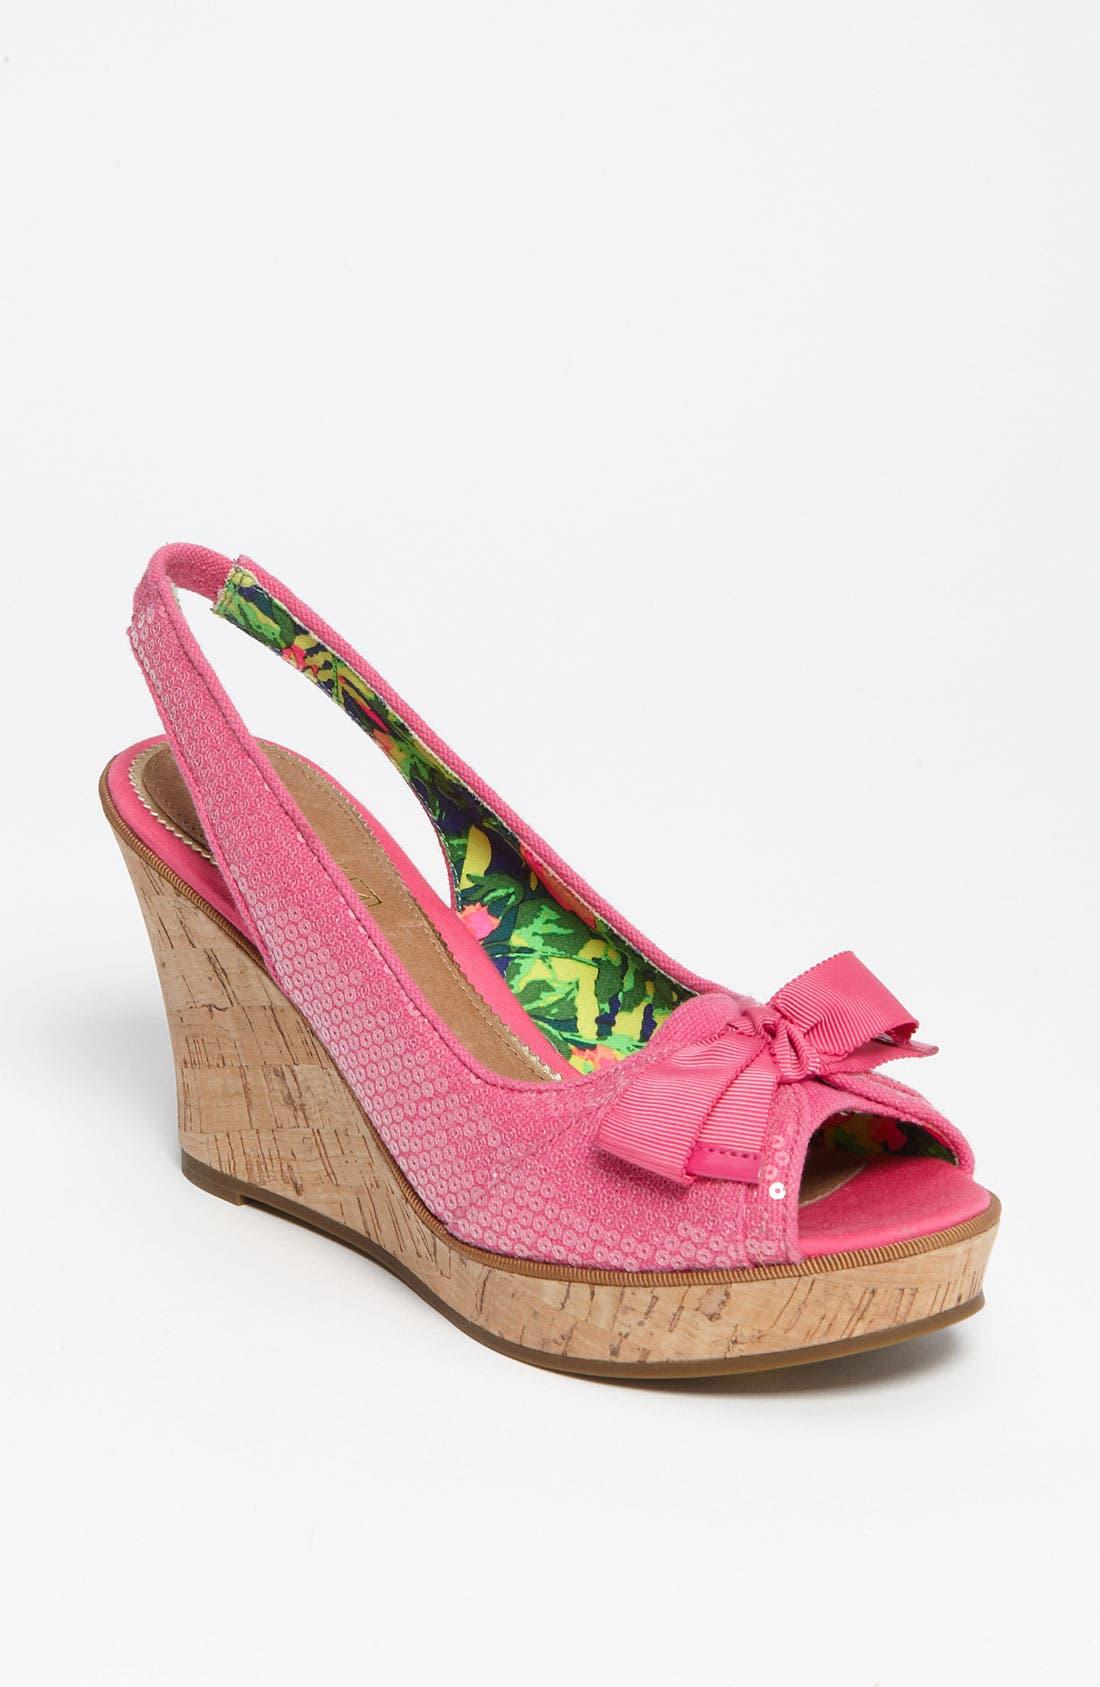 Alternate Image 1 Selected - Sperry Top-Sider® 'Southsea' Sandal